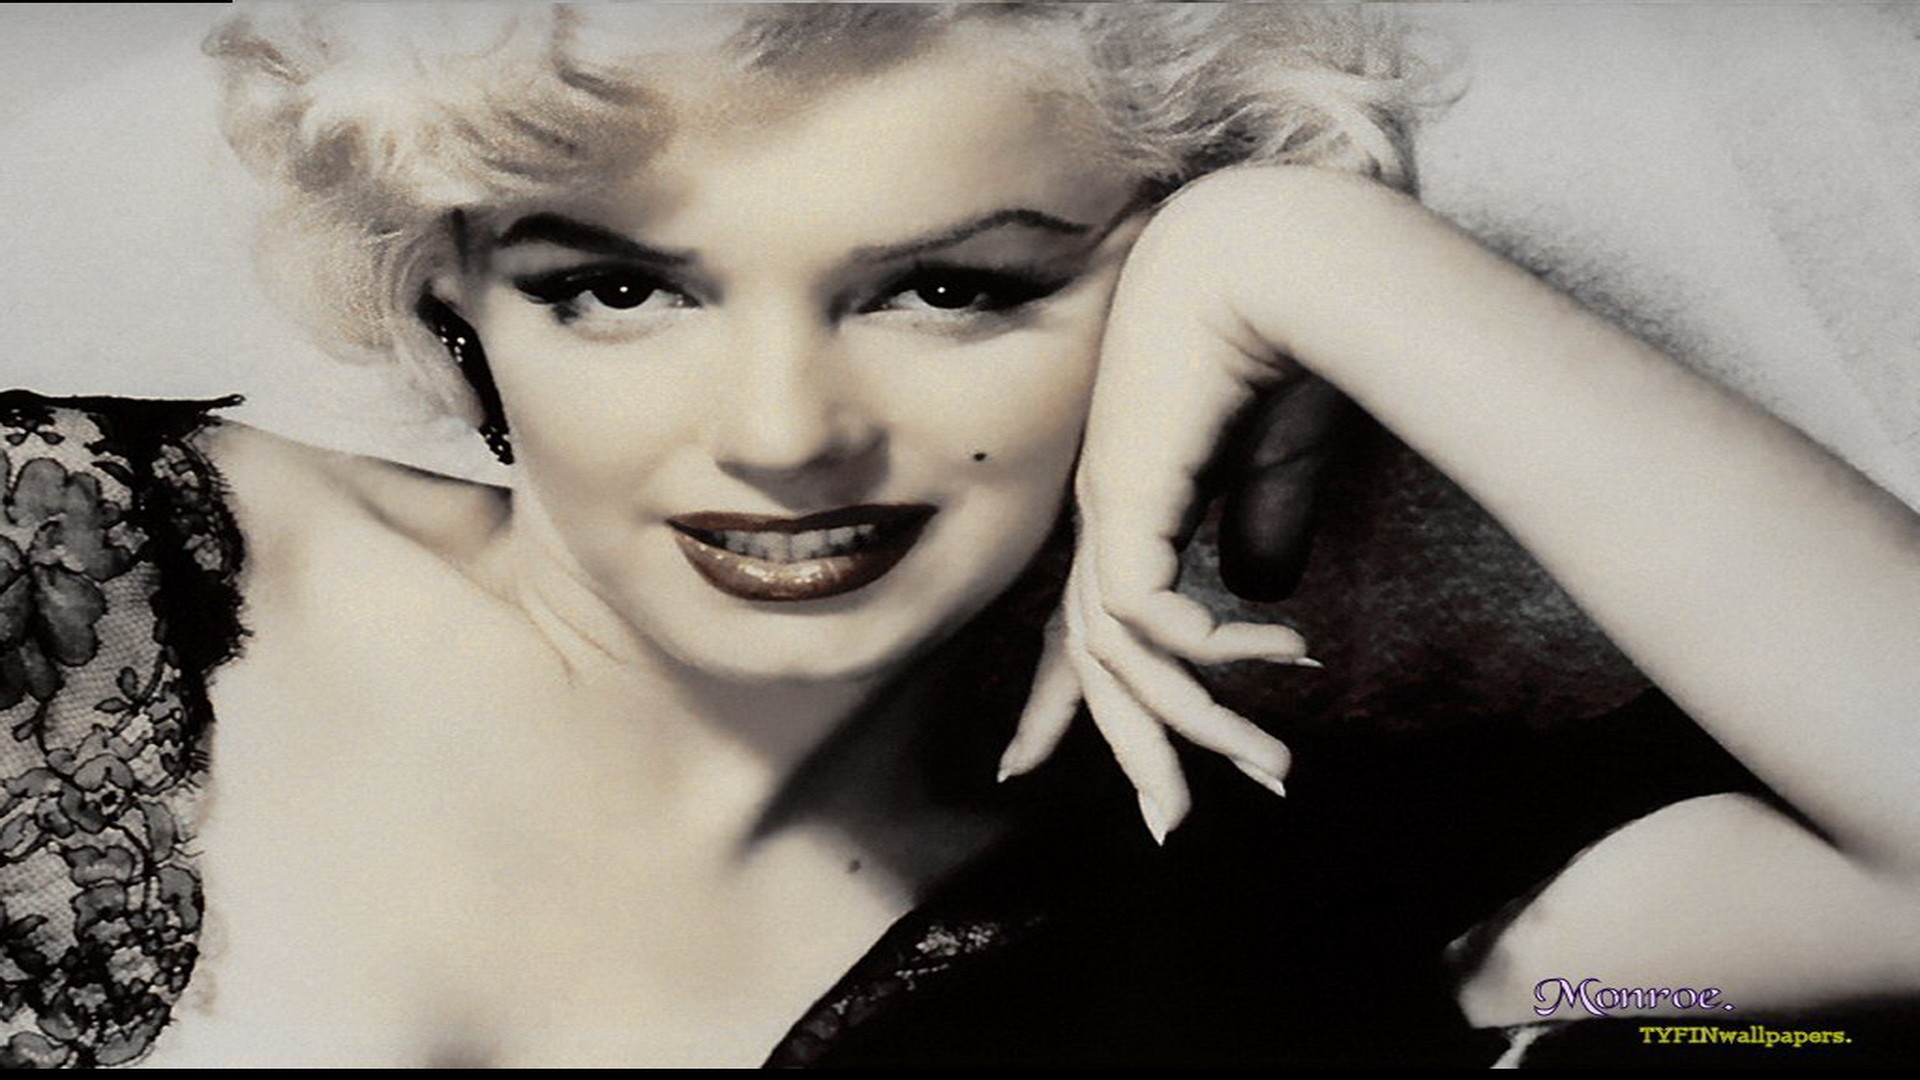 marilyn monroe wallpapers   Marilyn Monroe Wallpapers, HD, Wallpaper,  Photo, 1920×1080